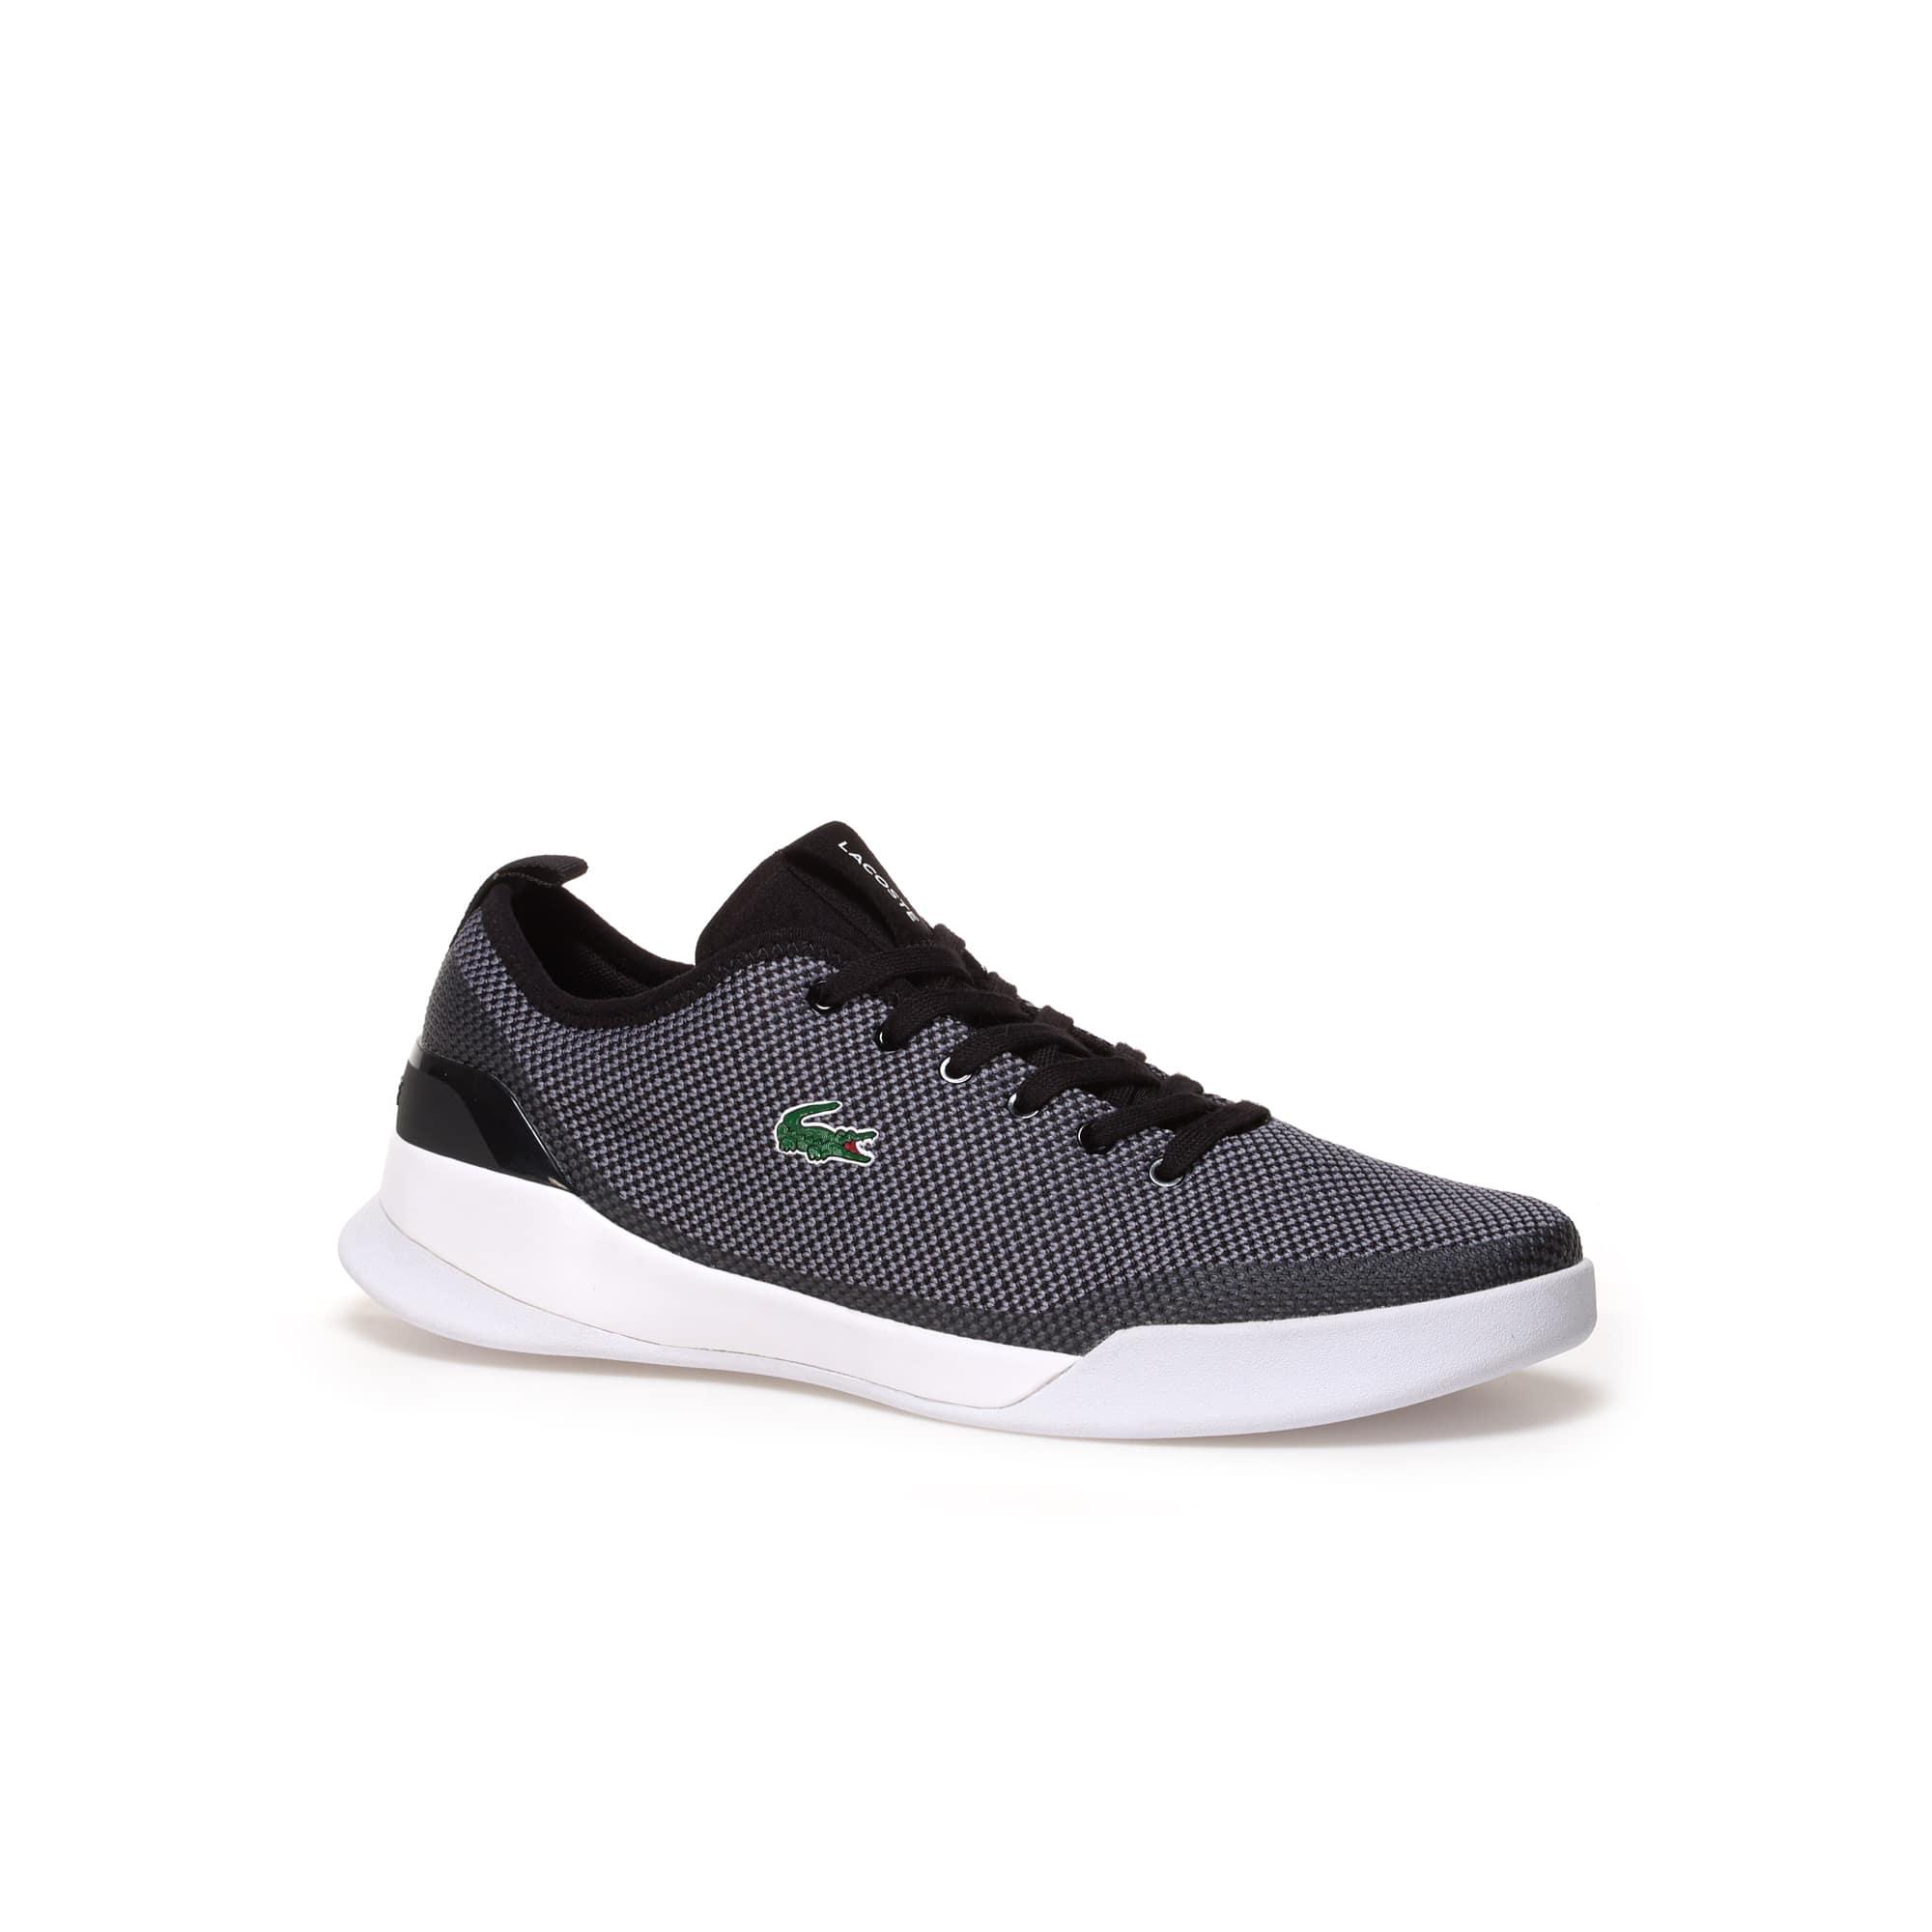 Herren-Sneakers LT DUAL aus Stoff